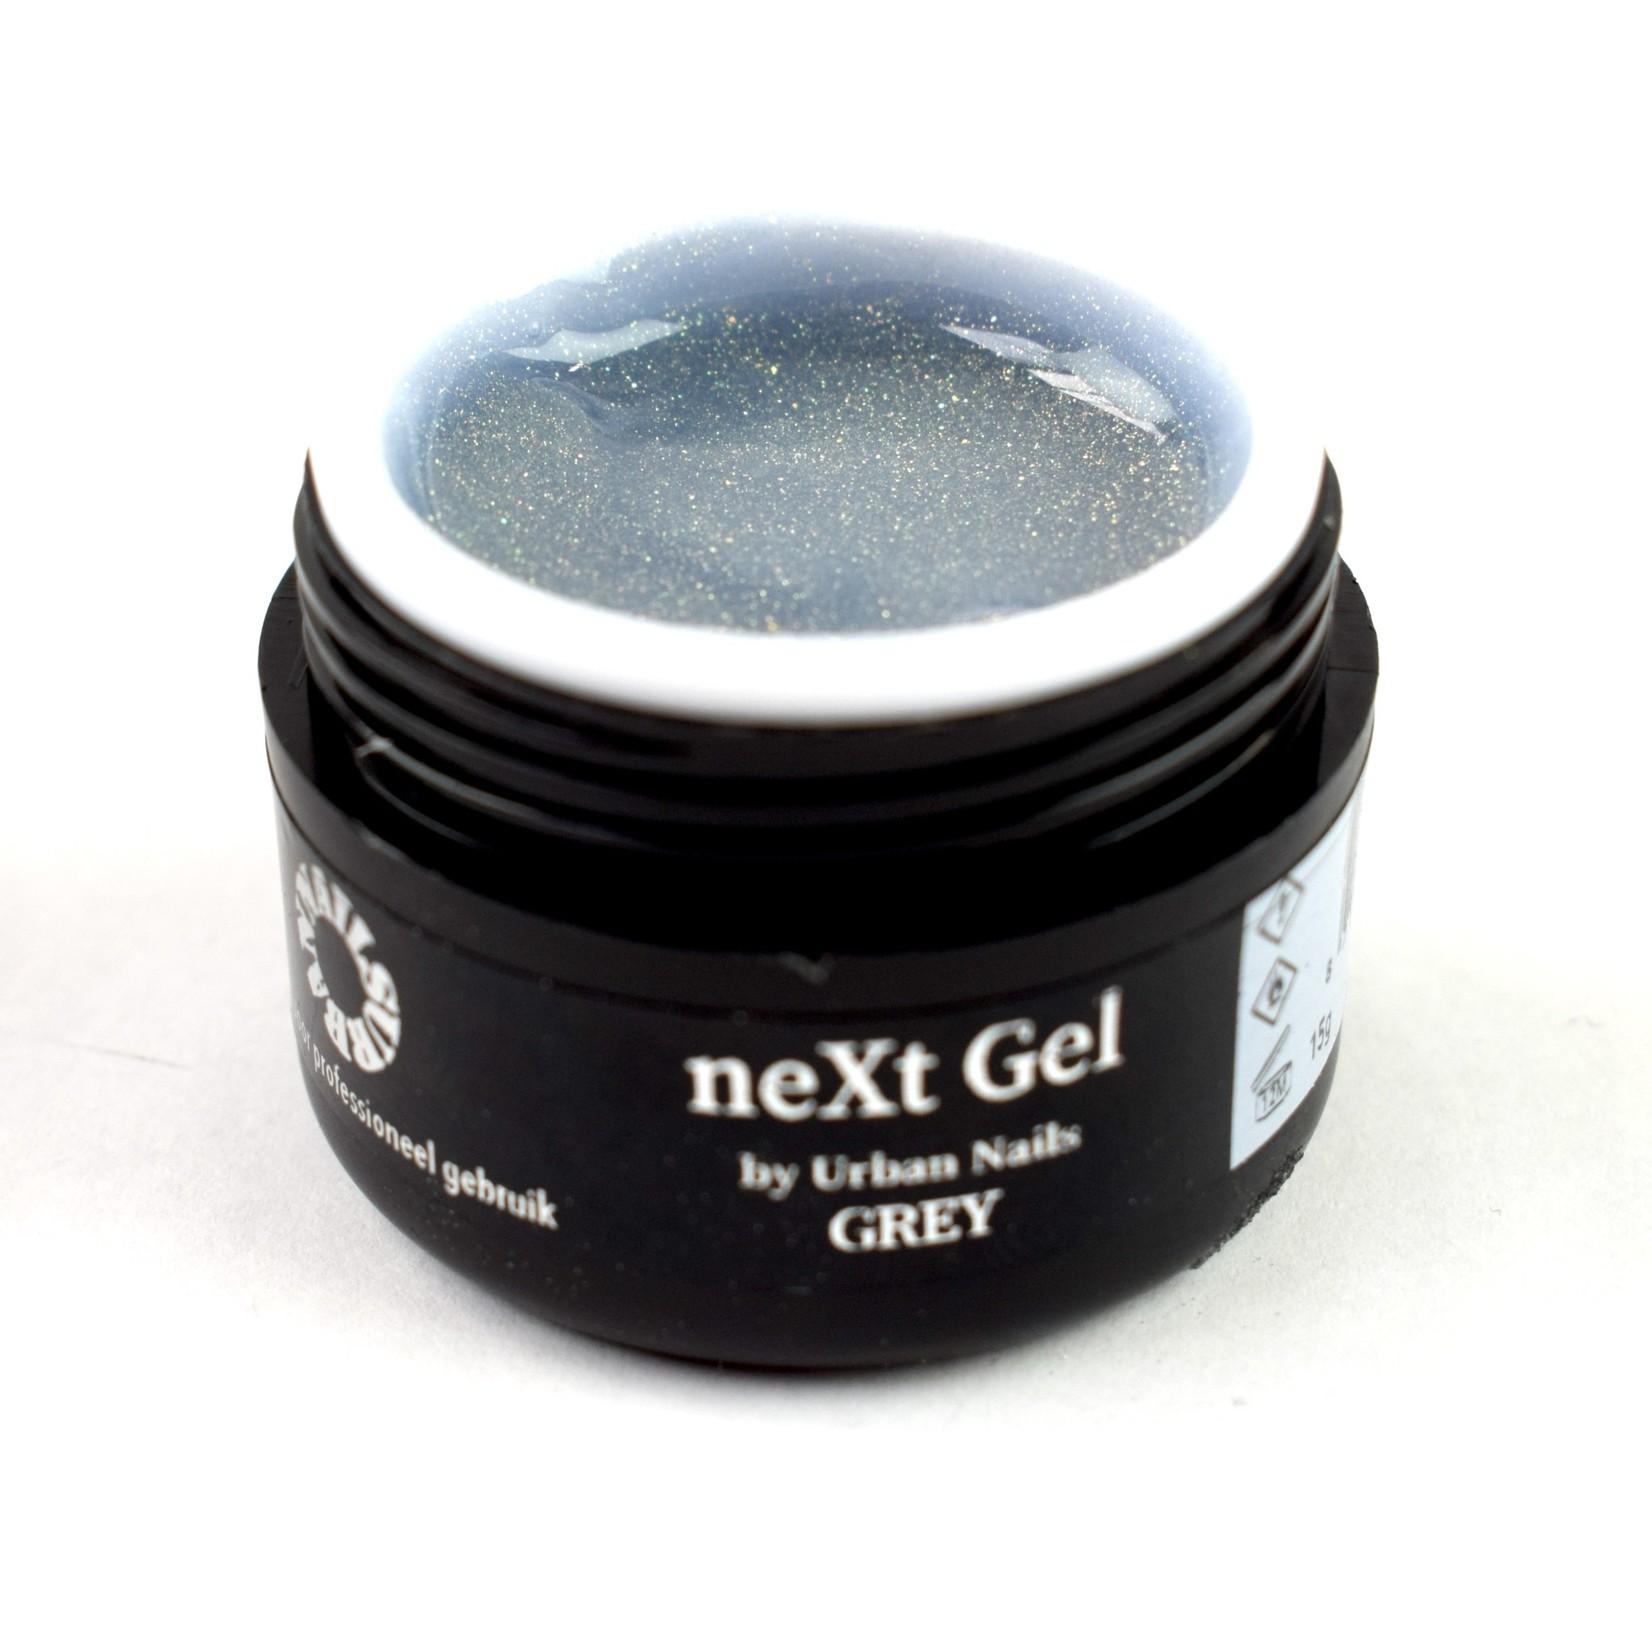 Urban Nails Next Gel Sparkle Grey